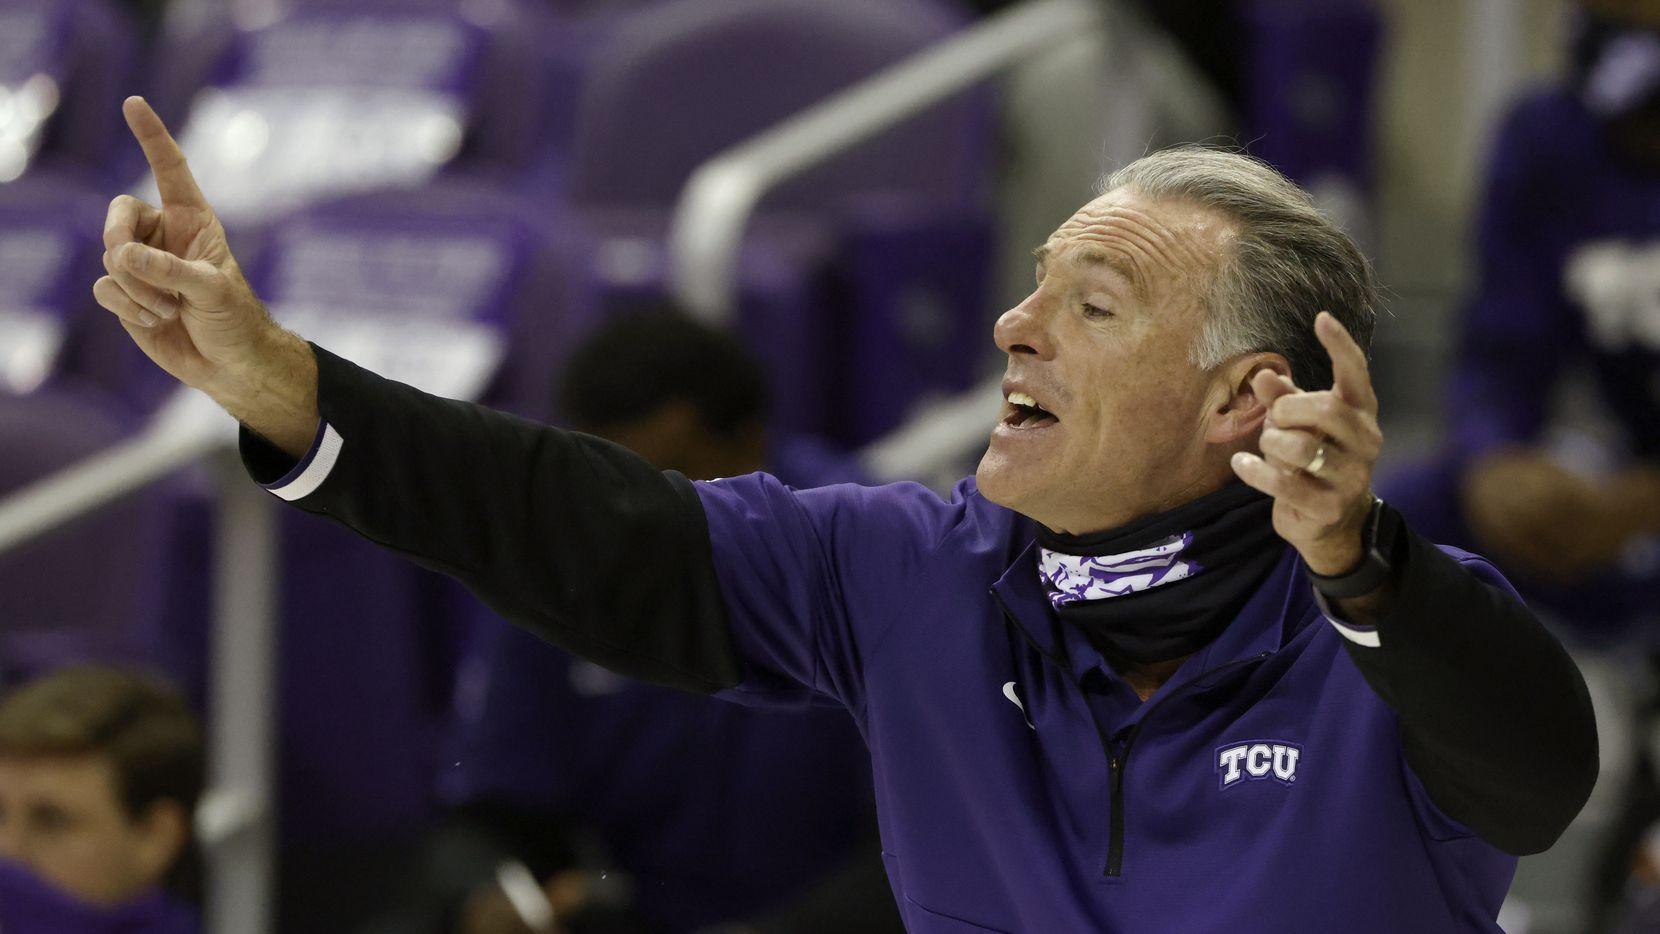 TCU head coach Jamie Dixon signals as TCU plays Kansas during the second half of an NCAA college basketball game, Tuesday, Jan. 5, 2021, in Fort Worth, Texas. Kansas won 93-64. (AP Photo/Ron Jenkins)